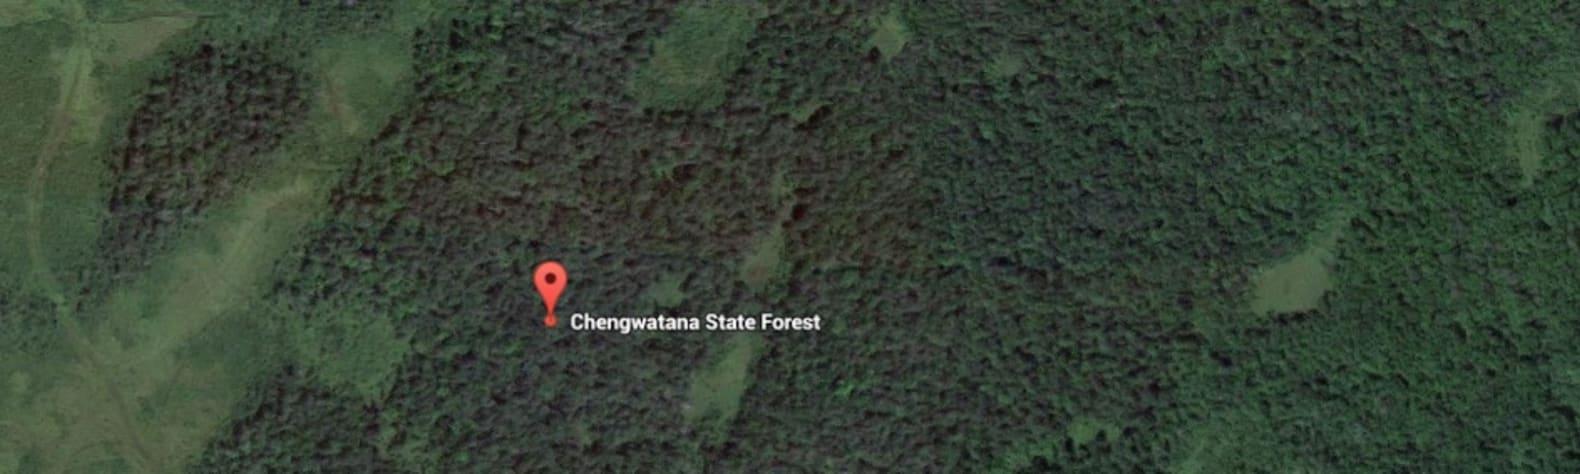 Chengwatana State Forest